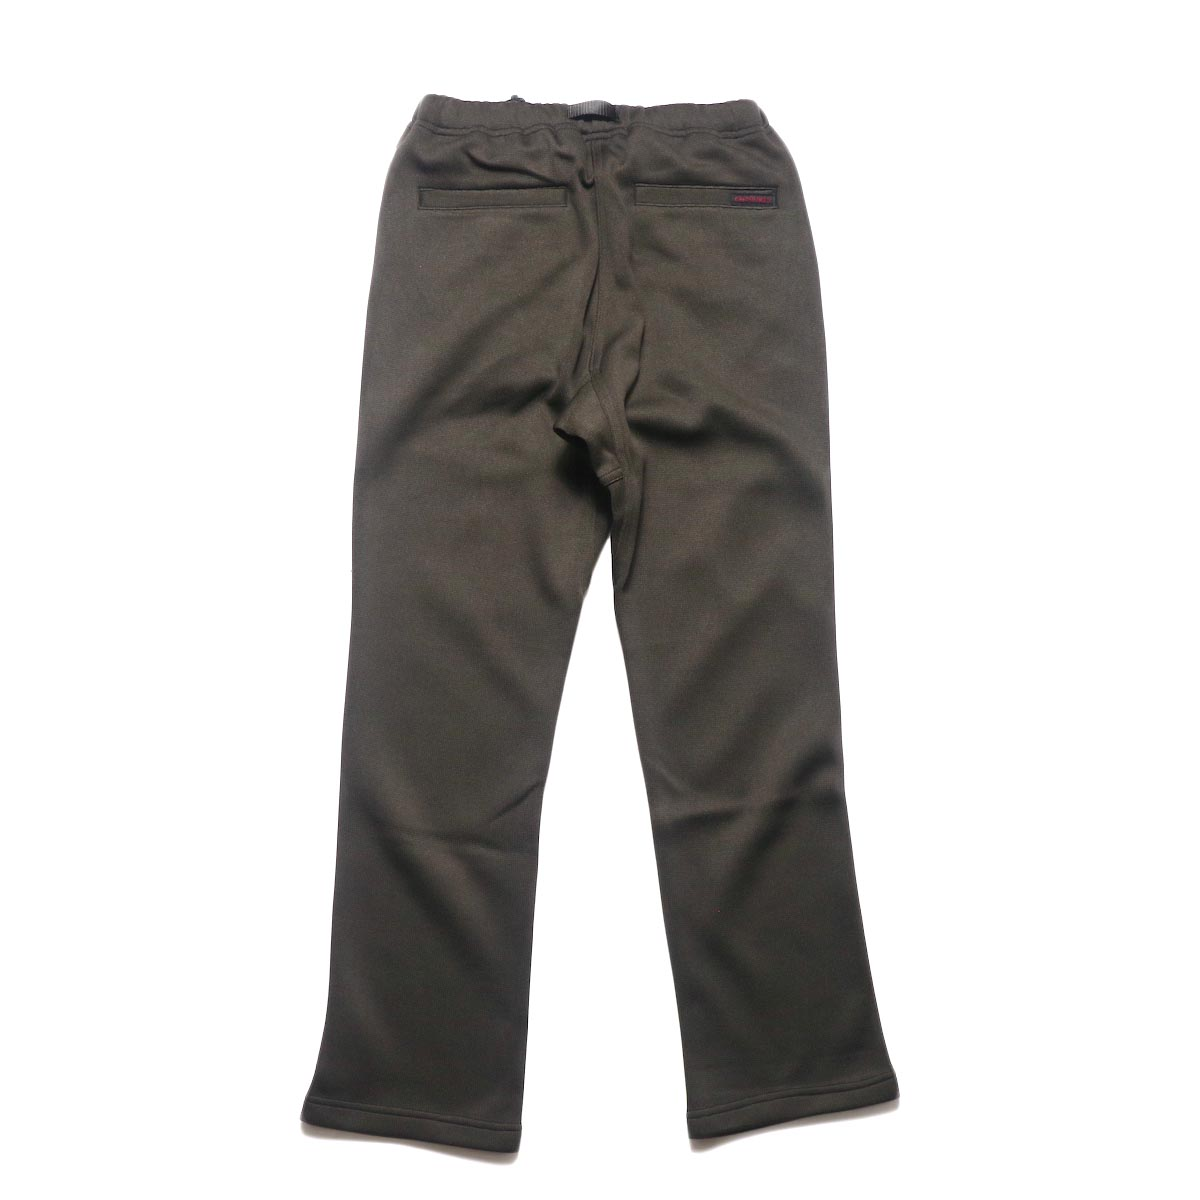 GRAMICCI / BONDING KNIT FLEECE NN-PANTS JUST CUT (Dark Brown)背面